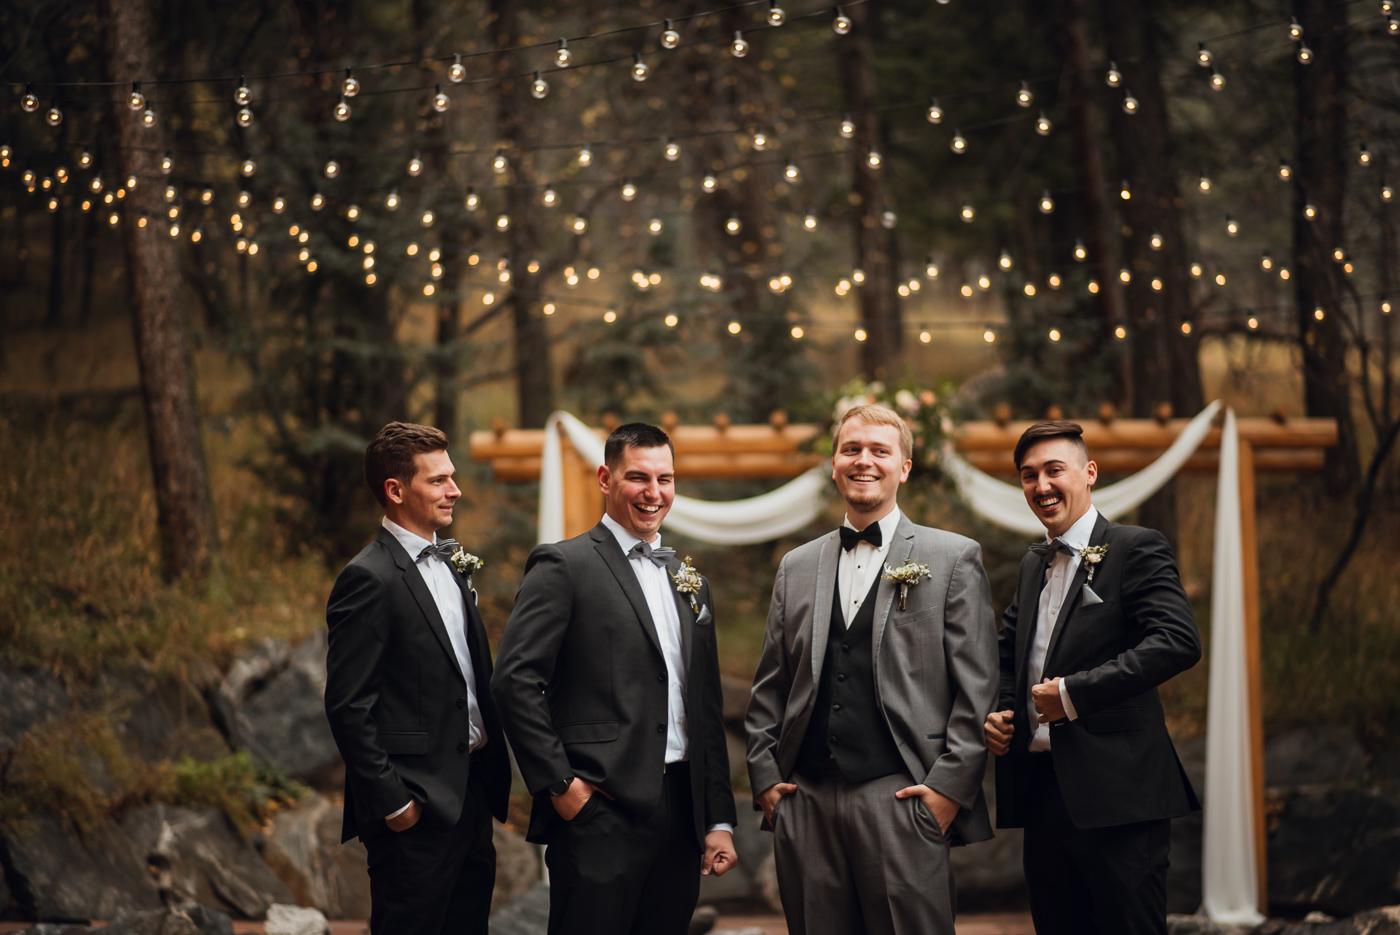 Candice Rawlin Wedding PHOCO Photography Pines Genesee Golden Colorado Fog -20.jpg